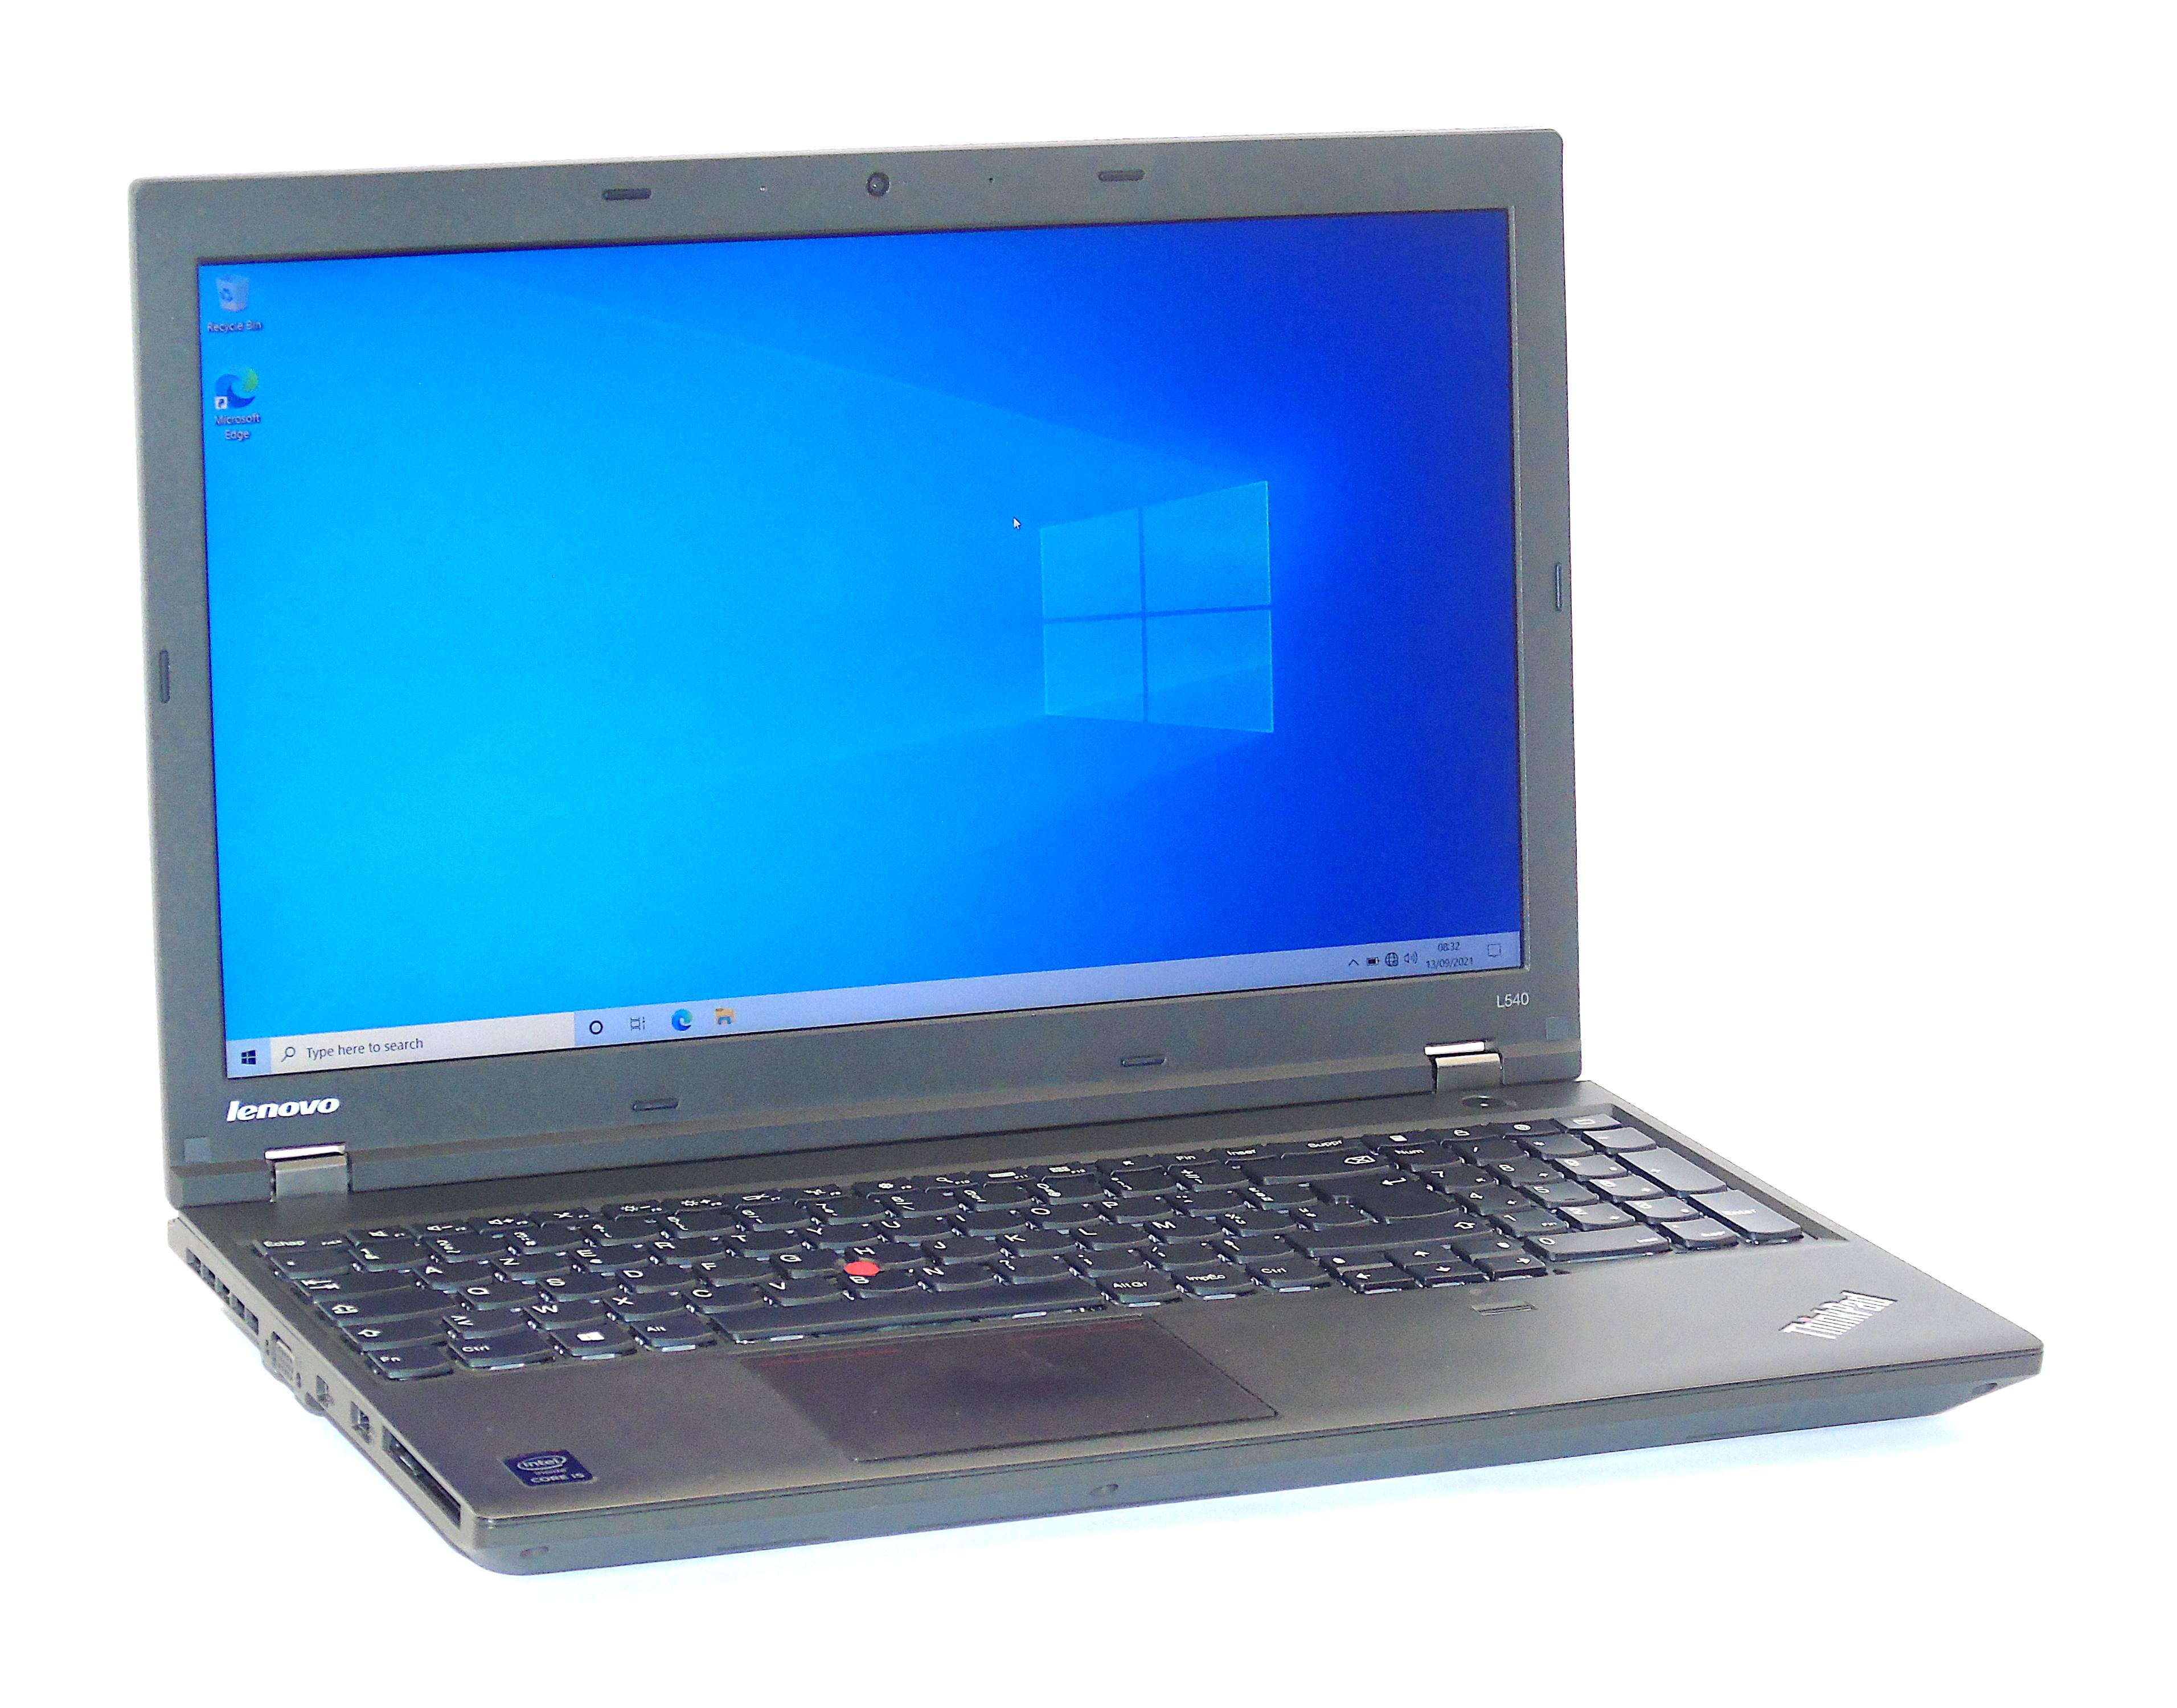 Lenovo ThinkPad L540 Core i5-4210M 8GB RAM 240GB SSD French Keyboard Windows 10